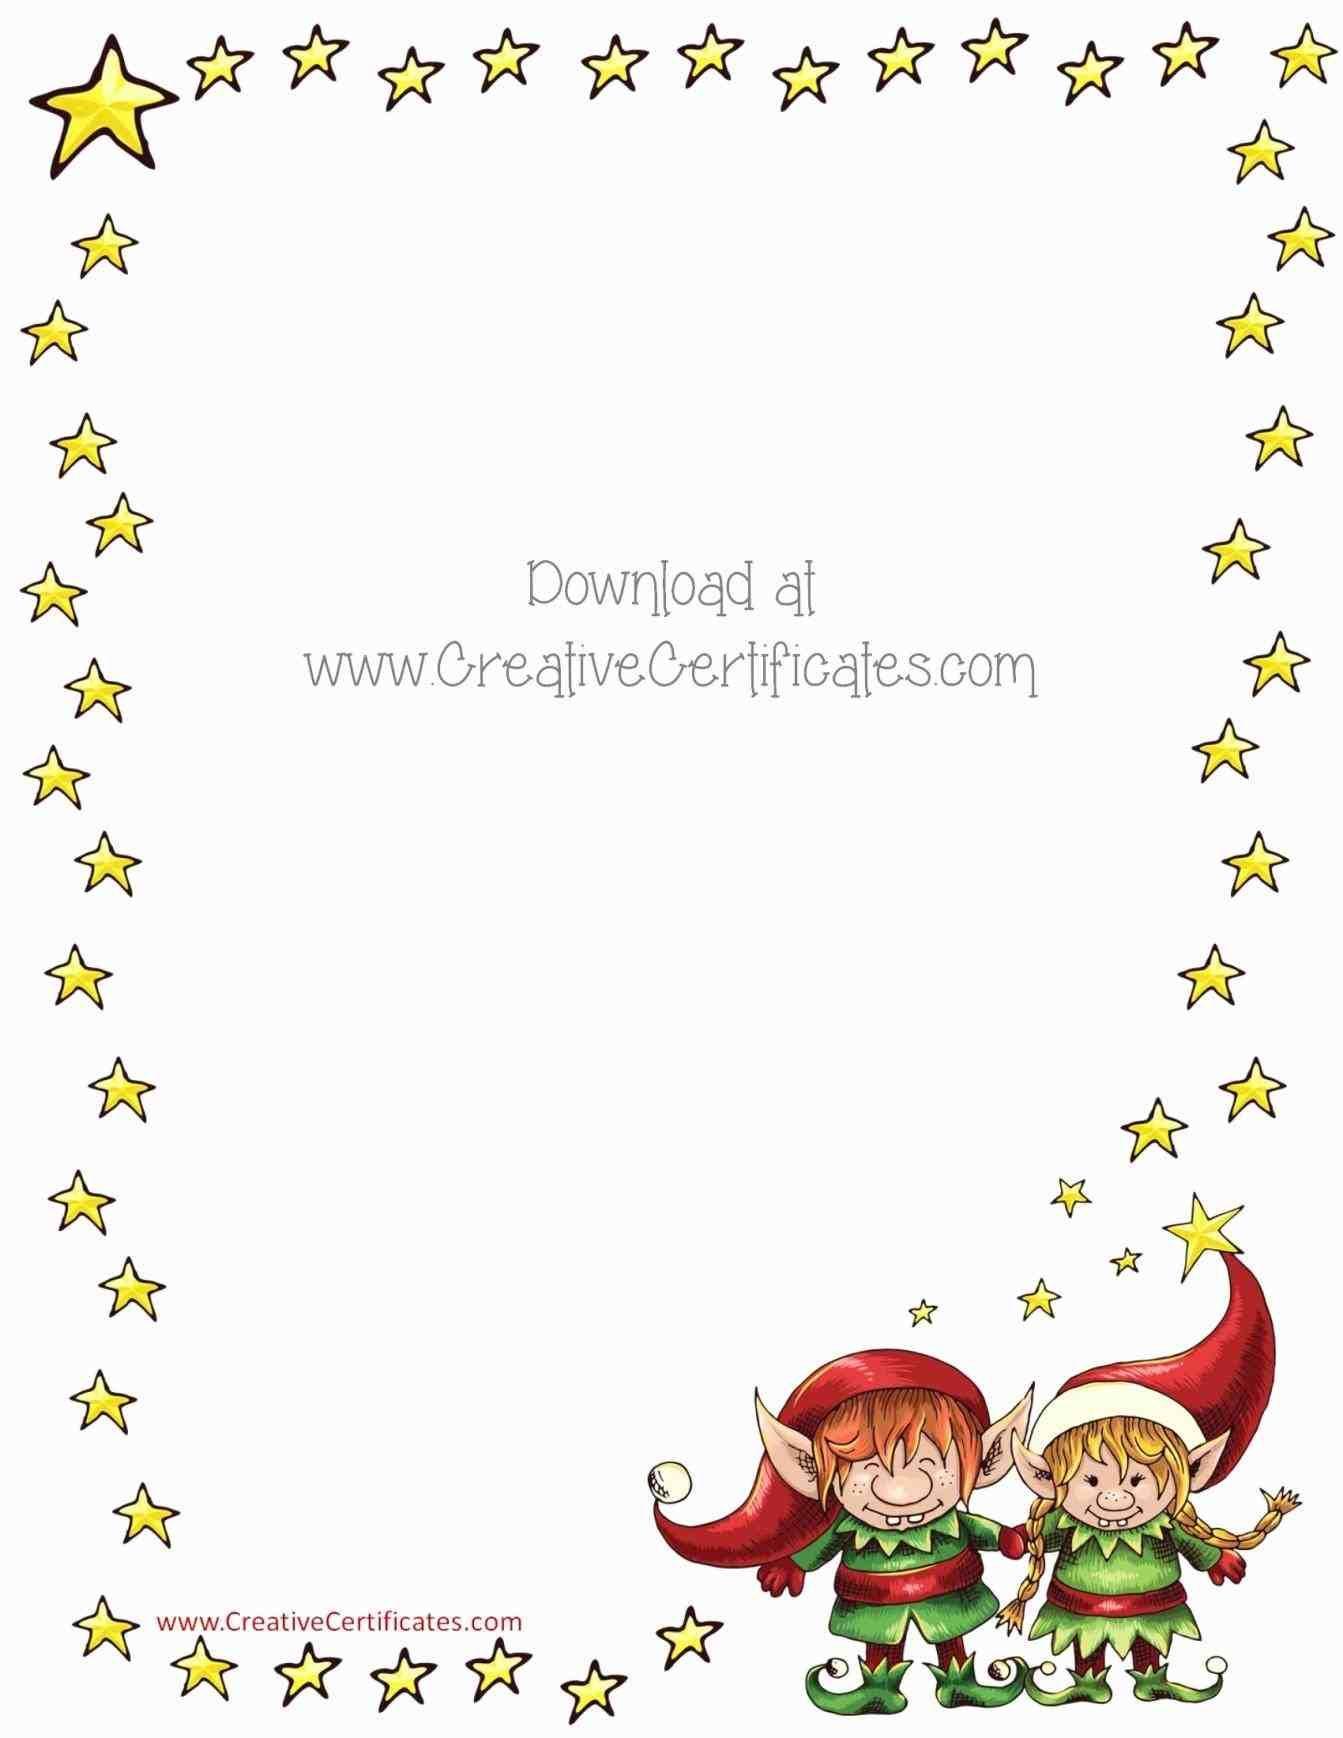 Christmas Templates For Word Pinterest Christmas Templates And